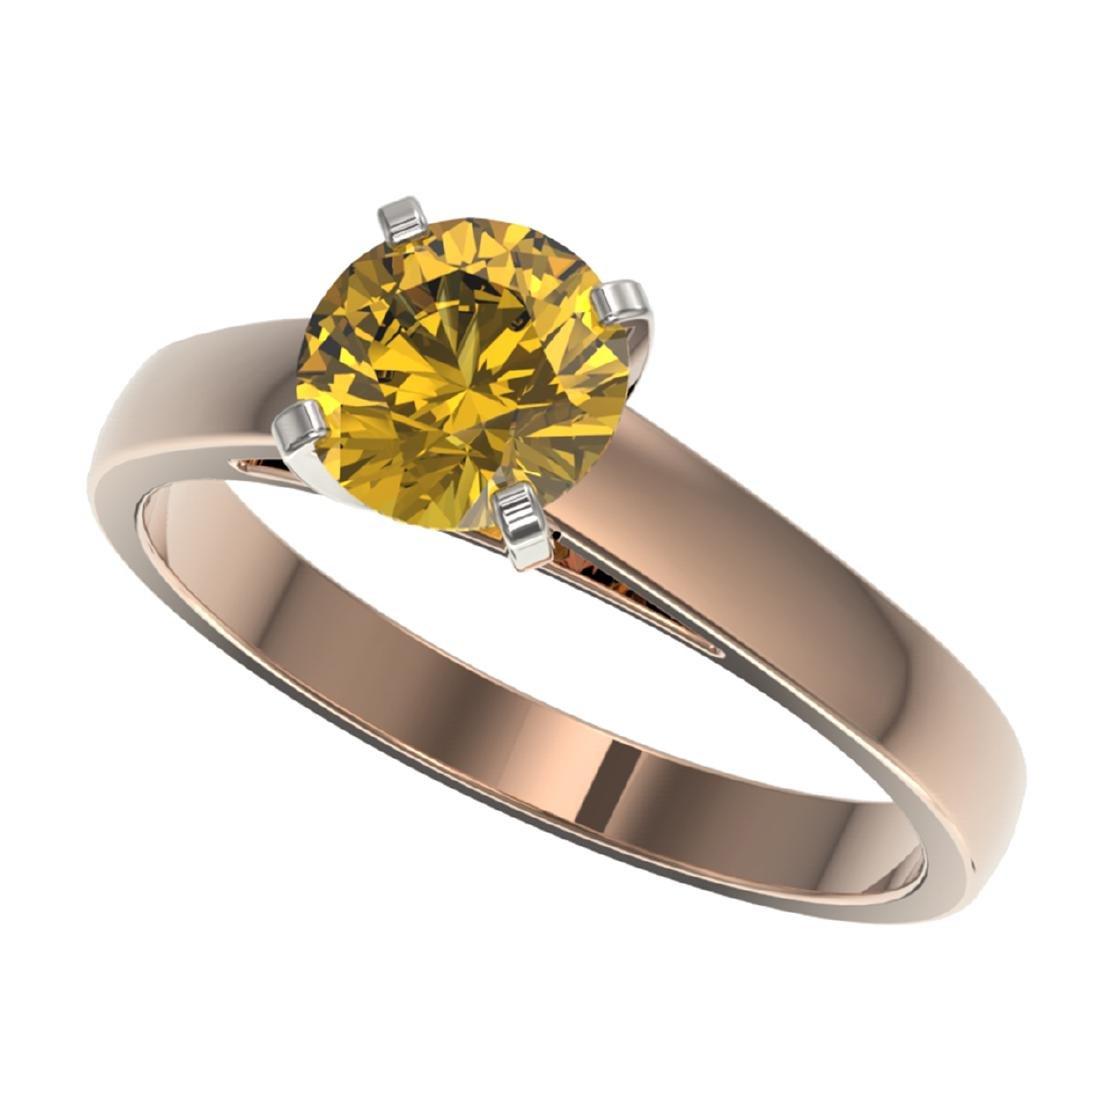 1.23 ctw Intense Yellow Diamond Solitaire Ring 10K Rose